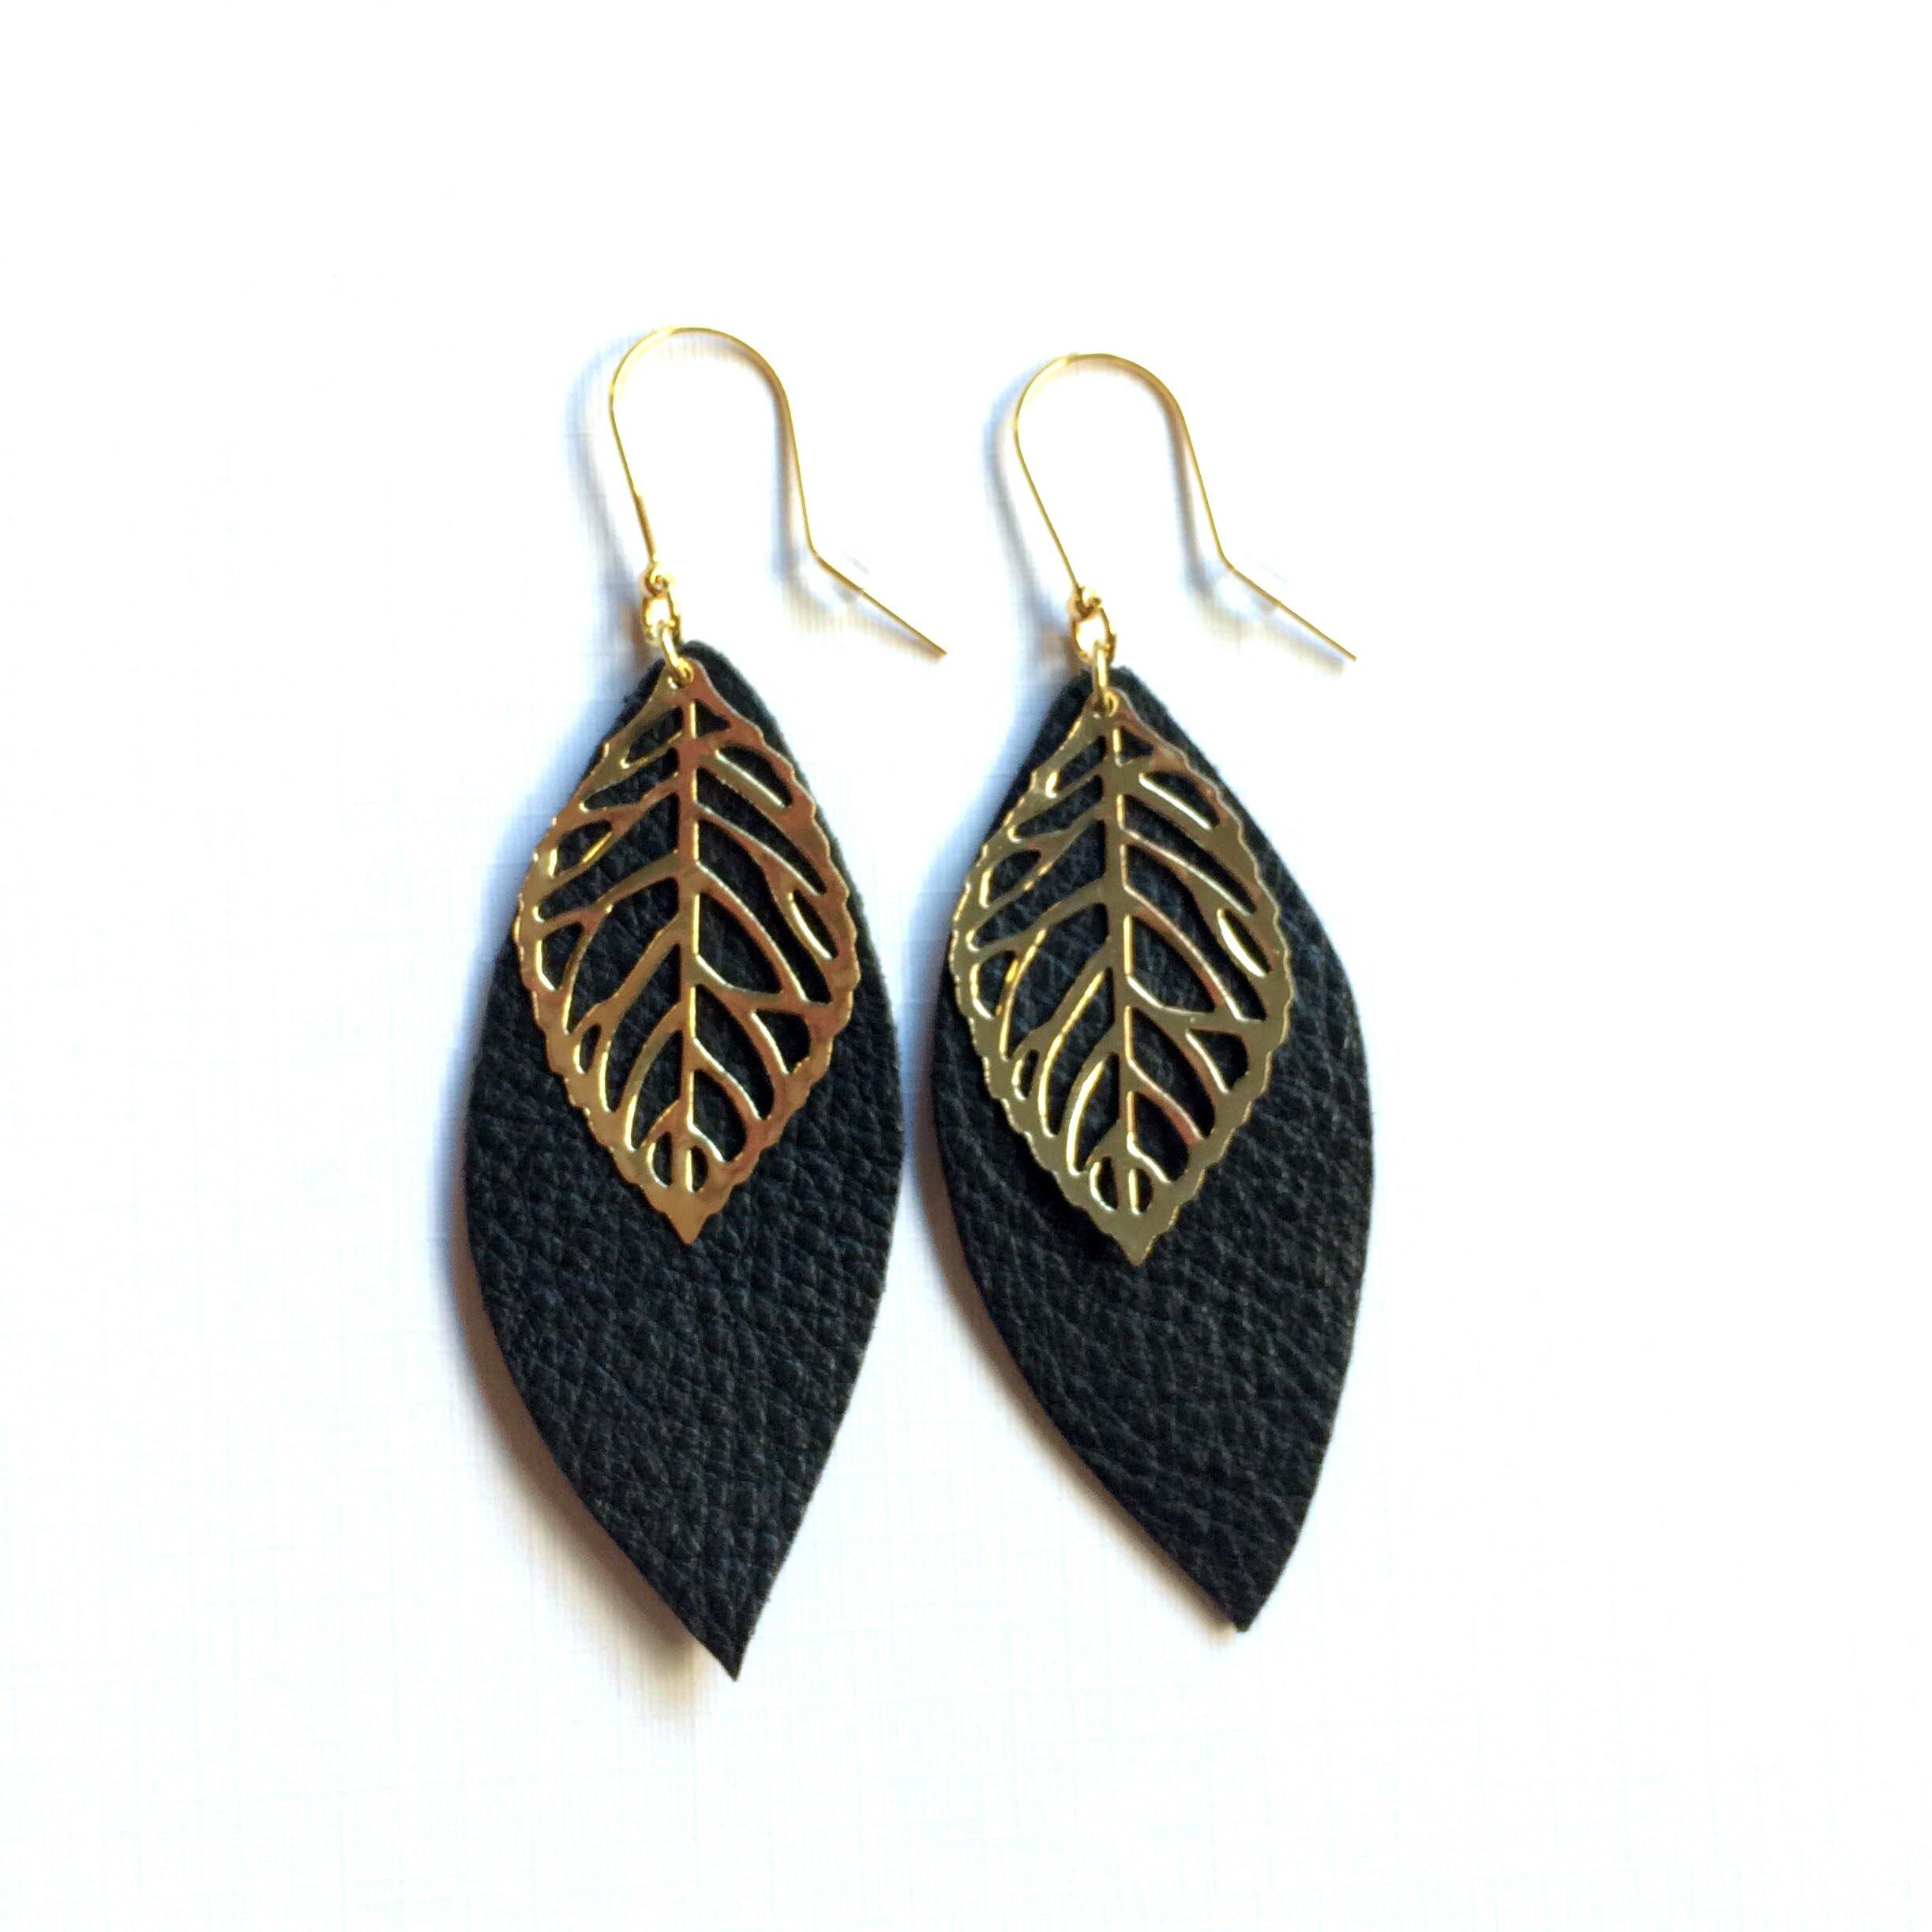 Dark gold brown mint leather earrings metallic gold feather earrings Leaf earrings long earrings Leather feather earrings leather jewelry